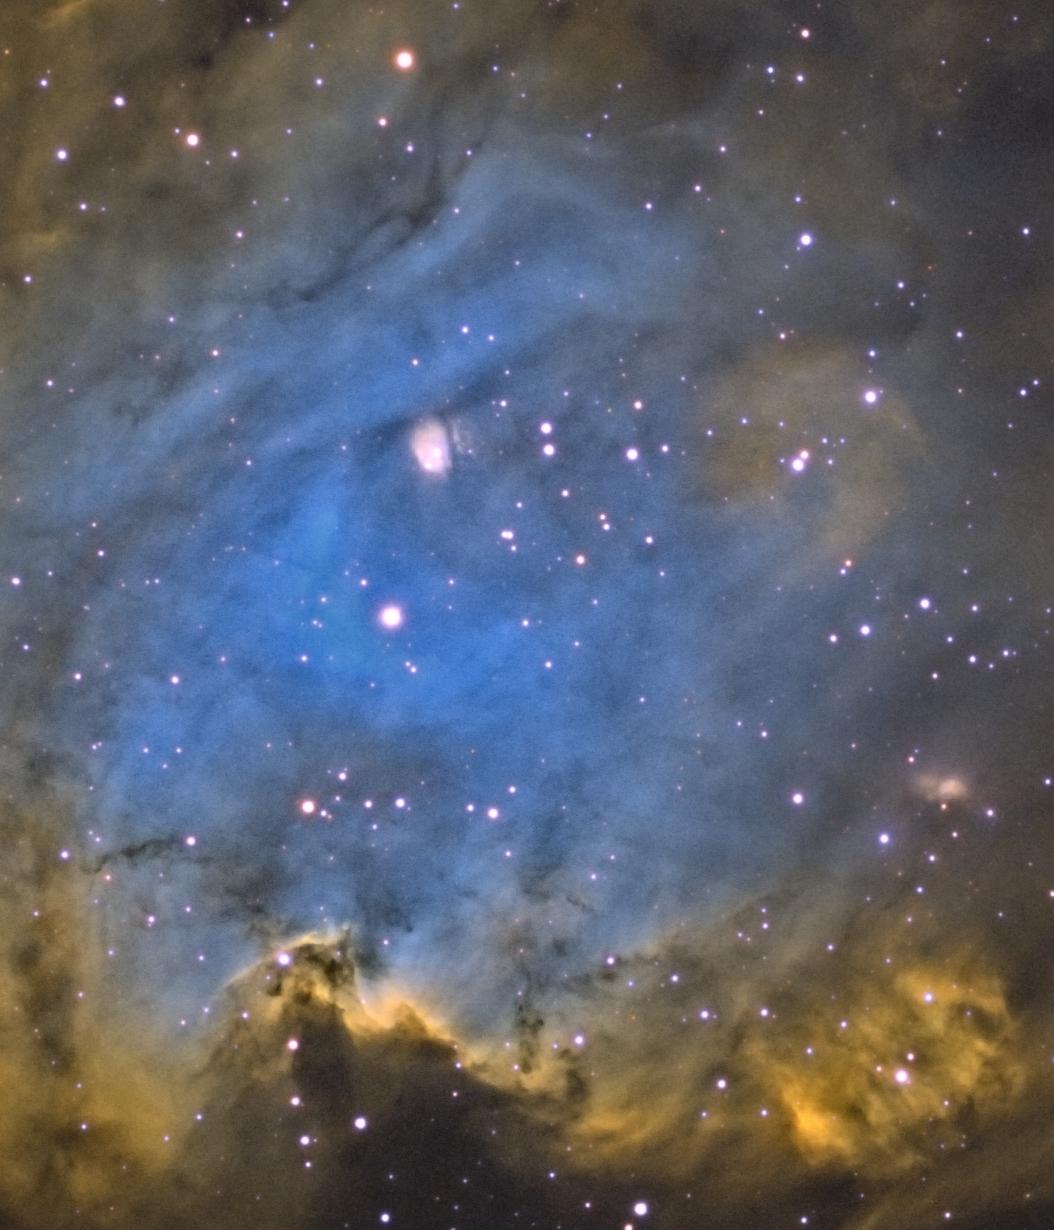 NGC 2175 AP130EDT w/ 0.75X Reducer (f/6.3) Apogee Ascent A694 CCD Baader Narrowband Filters 7x20min Ha 10x20min O[III] 9x20min S[II]